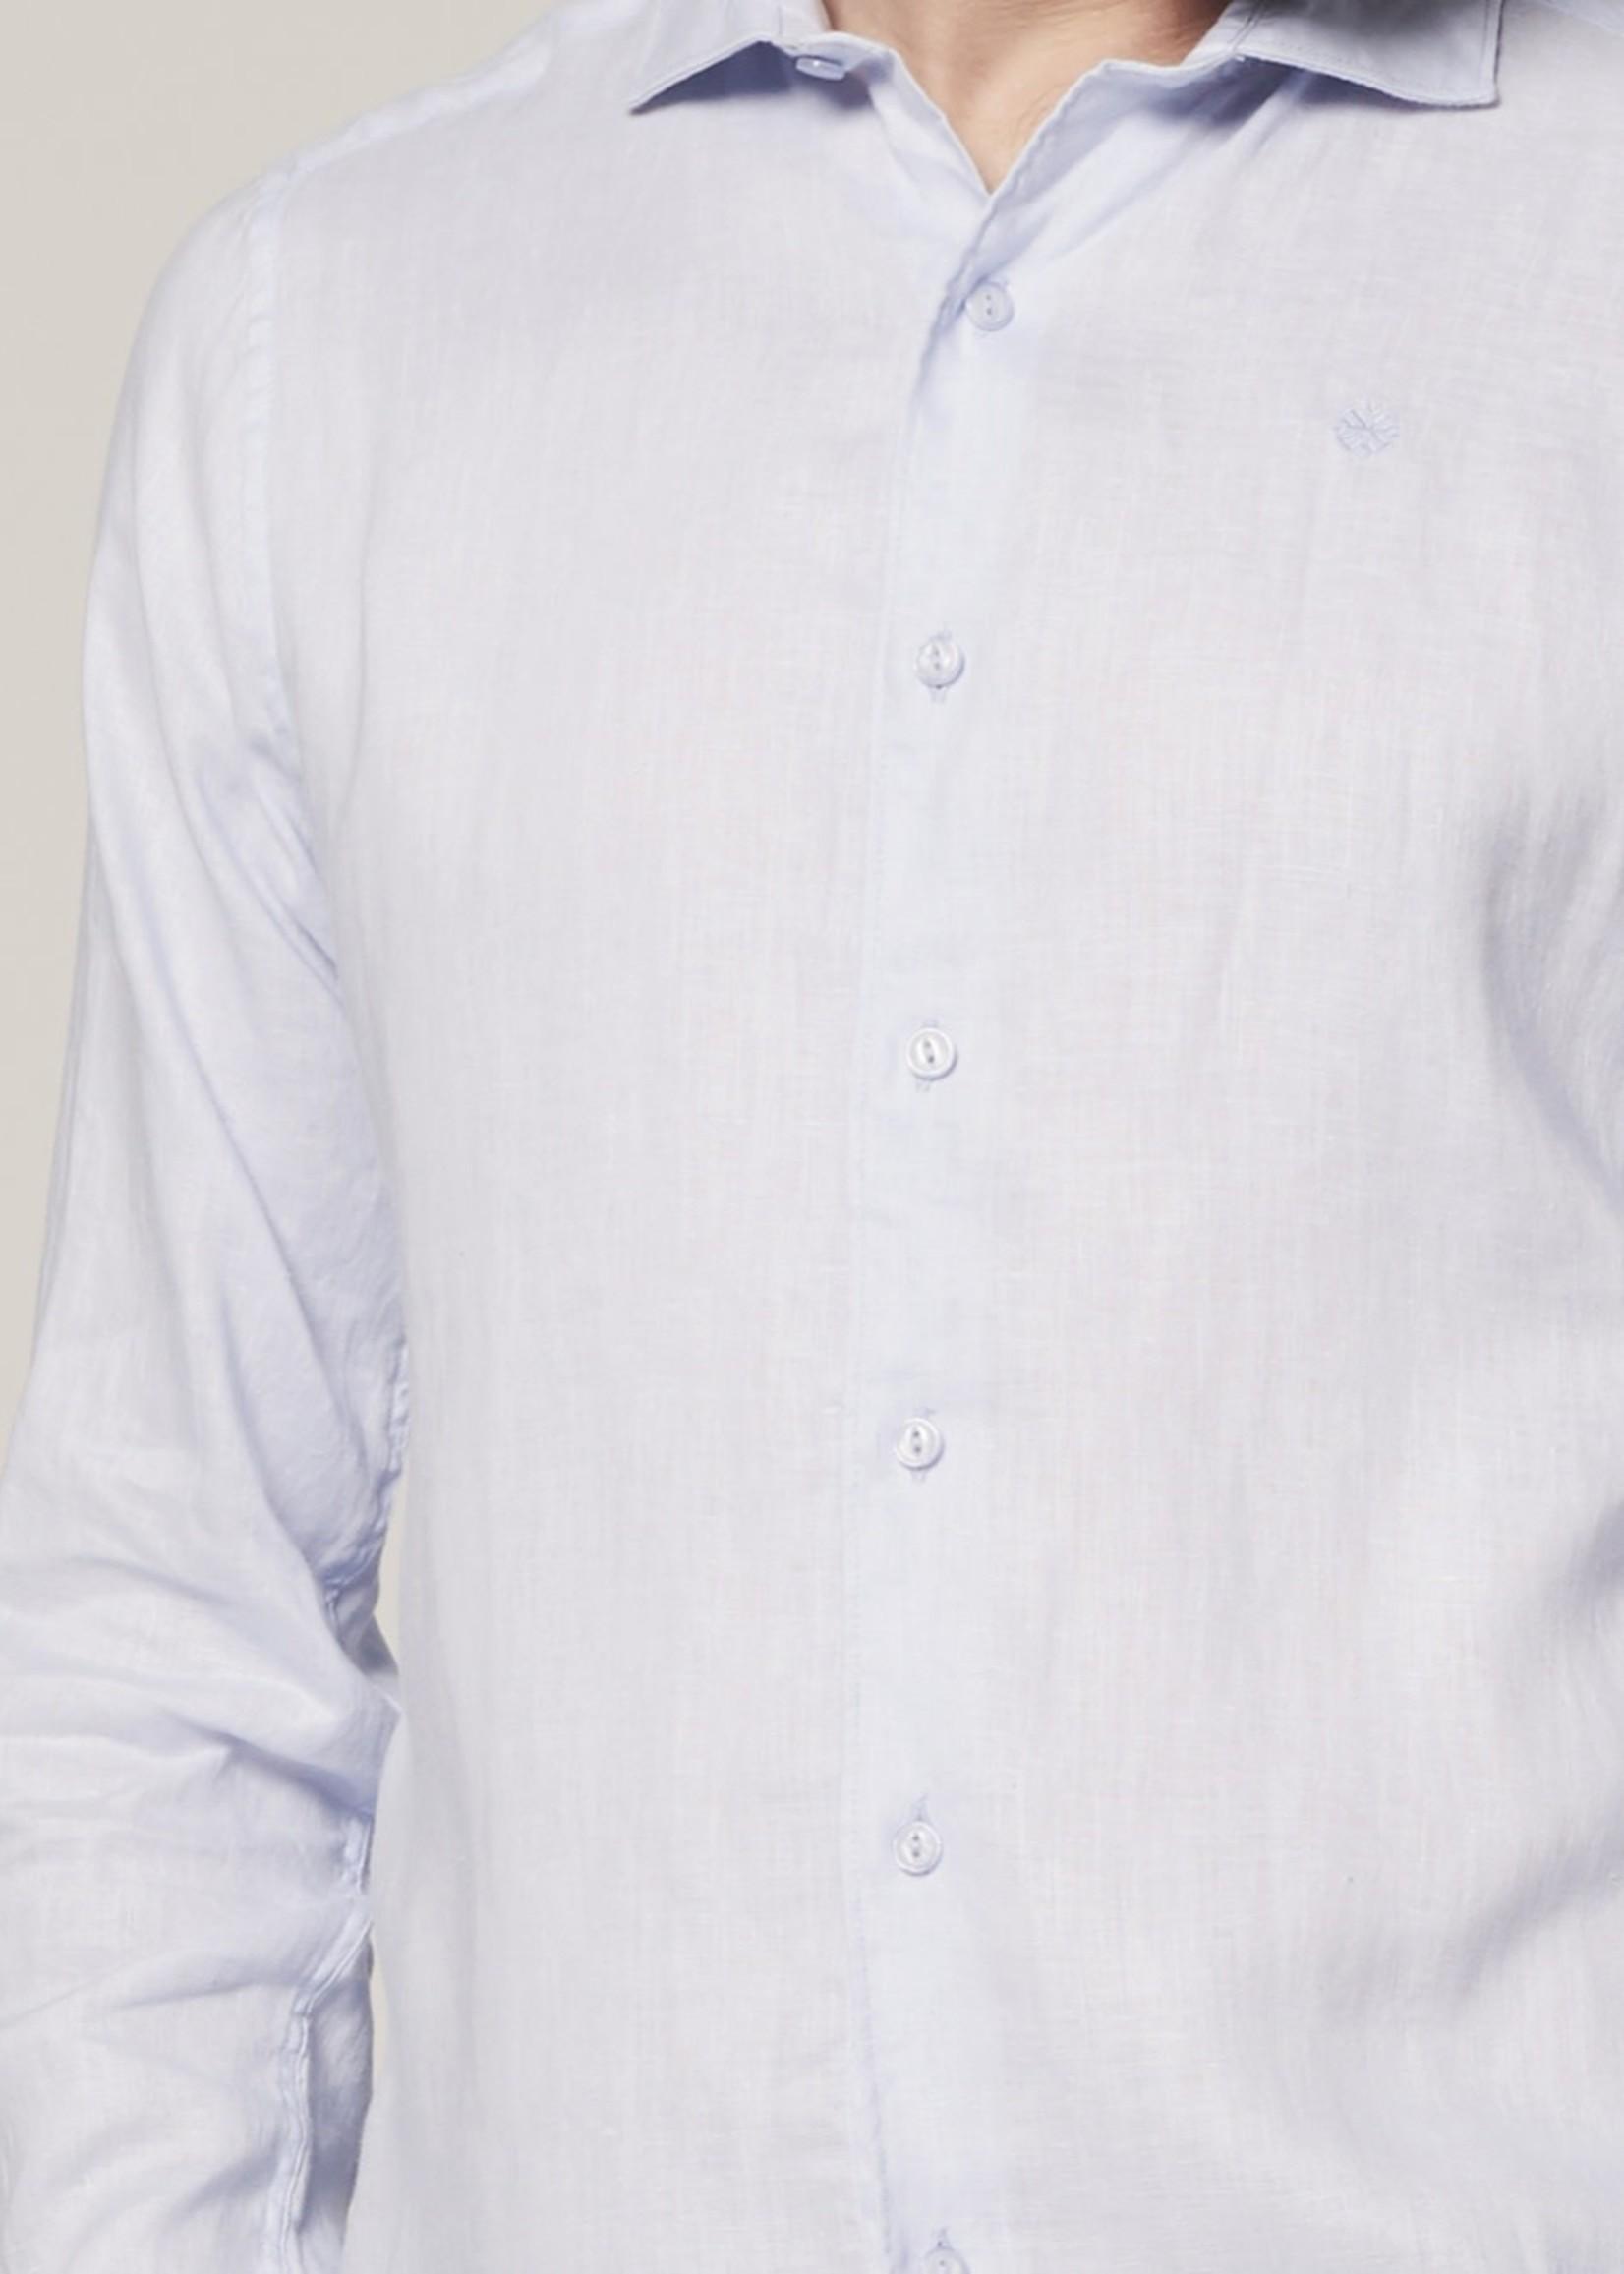 Dstrezzed 100% linnen overhemd   Lichtblauw   Dstrezzed